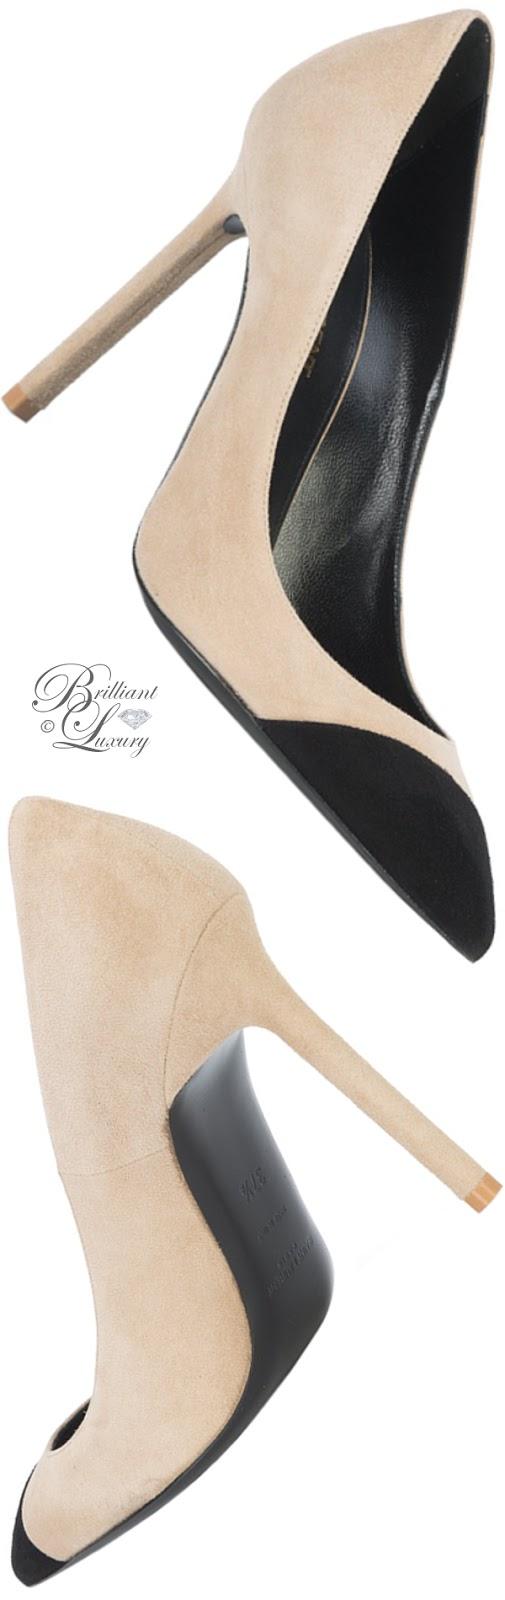 Brilliant Luxury ♦ Saint Laurent Anja pumps